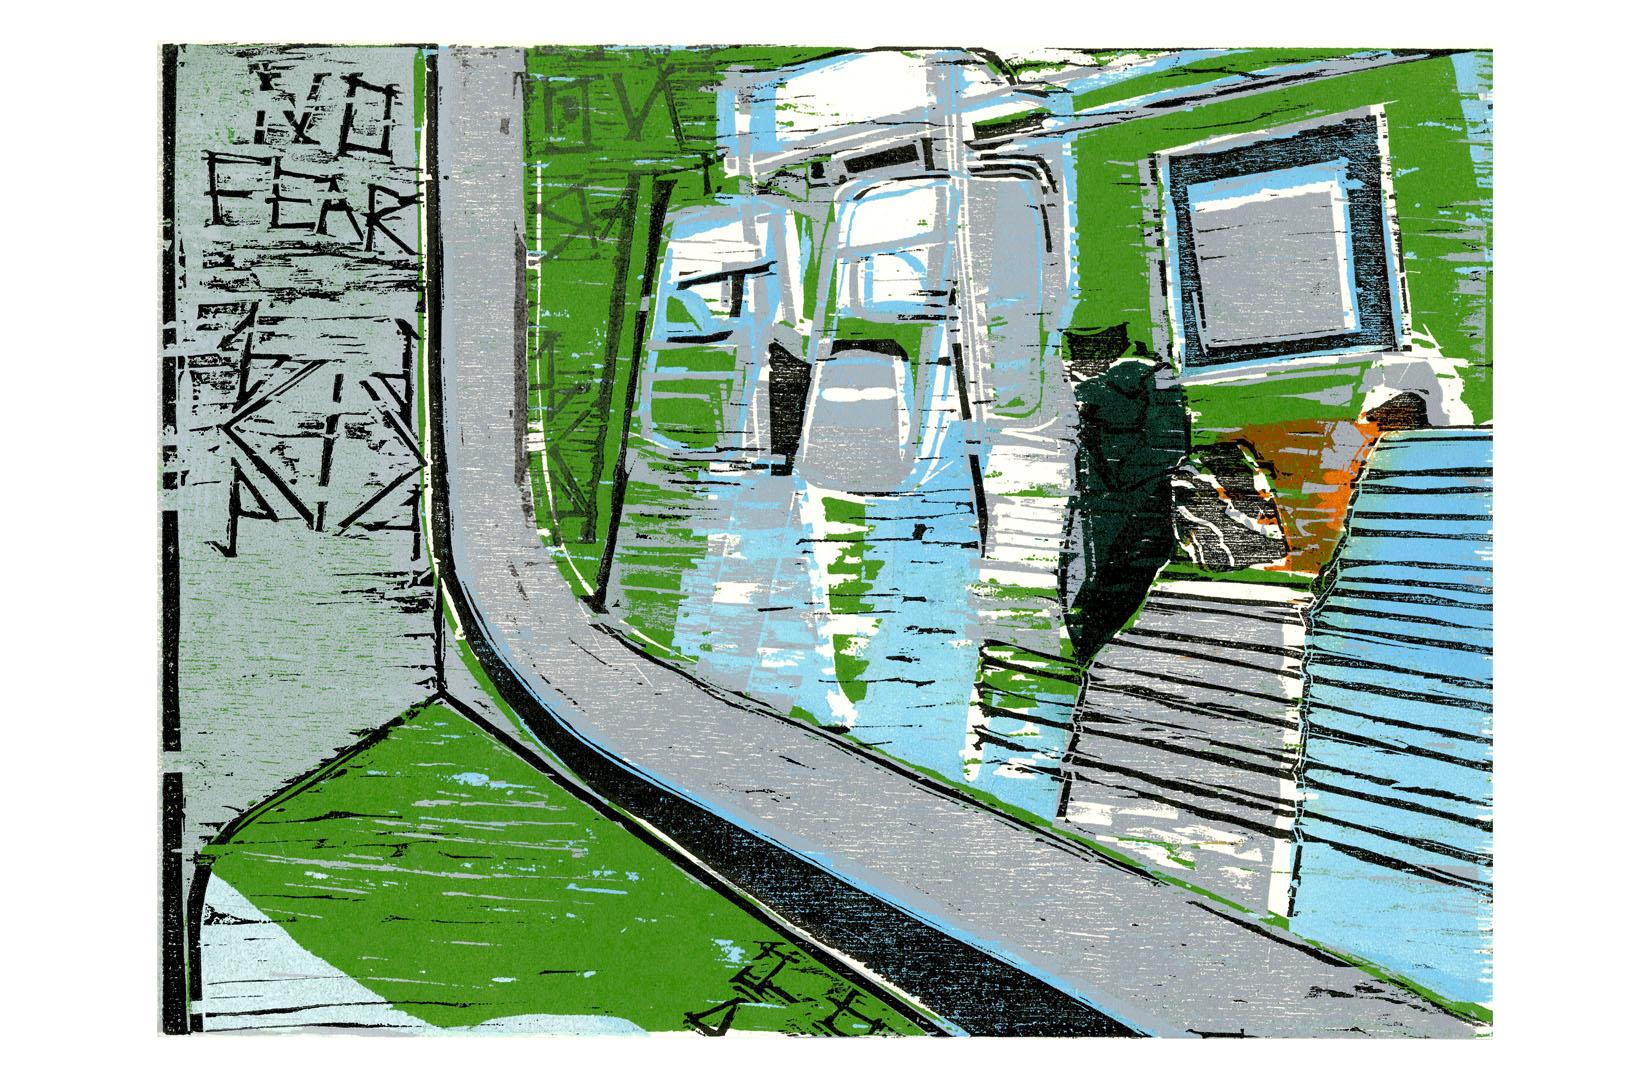 printmaking, ink, paper, 5 color print, five color print, brooklyn, nyc, new york city, brooklyn, Harlem, A train, drop print,